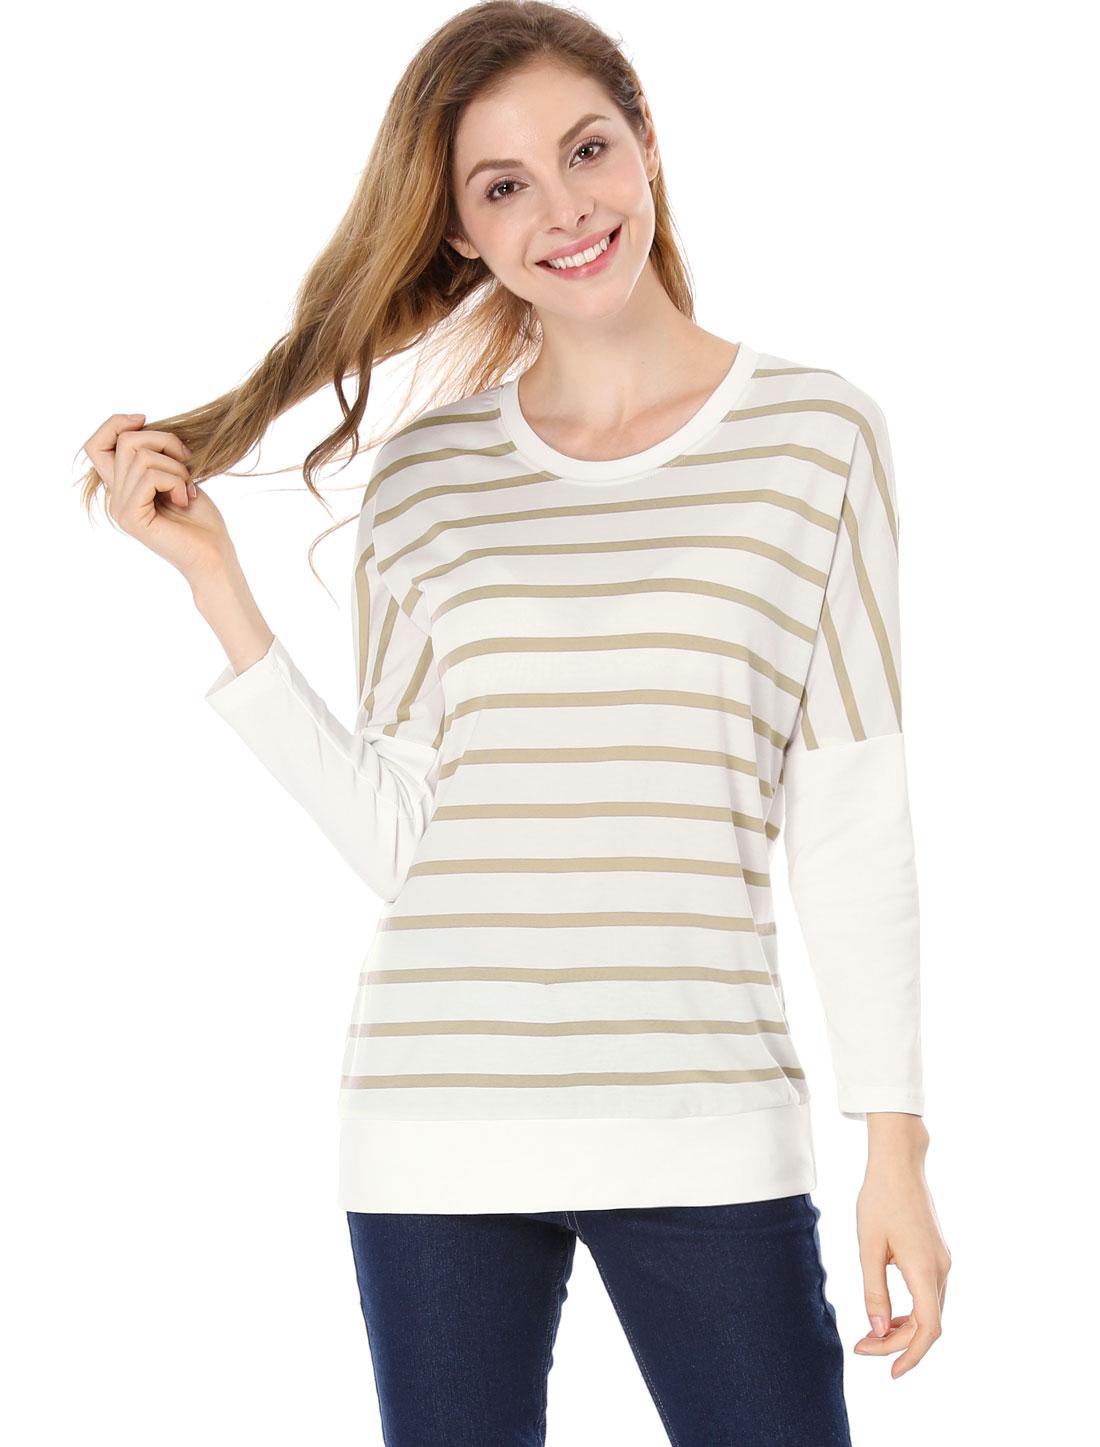 Women Dolman Sleeves Paneled Stripes Loose Tunic Top Brown XL